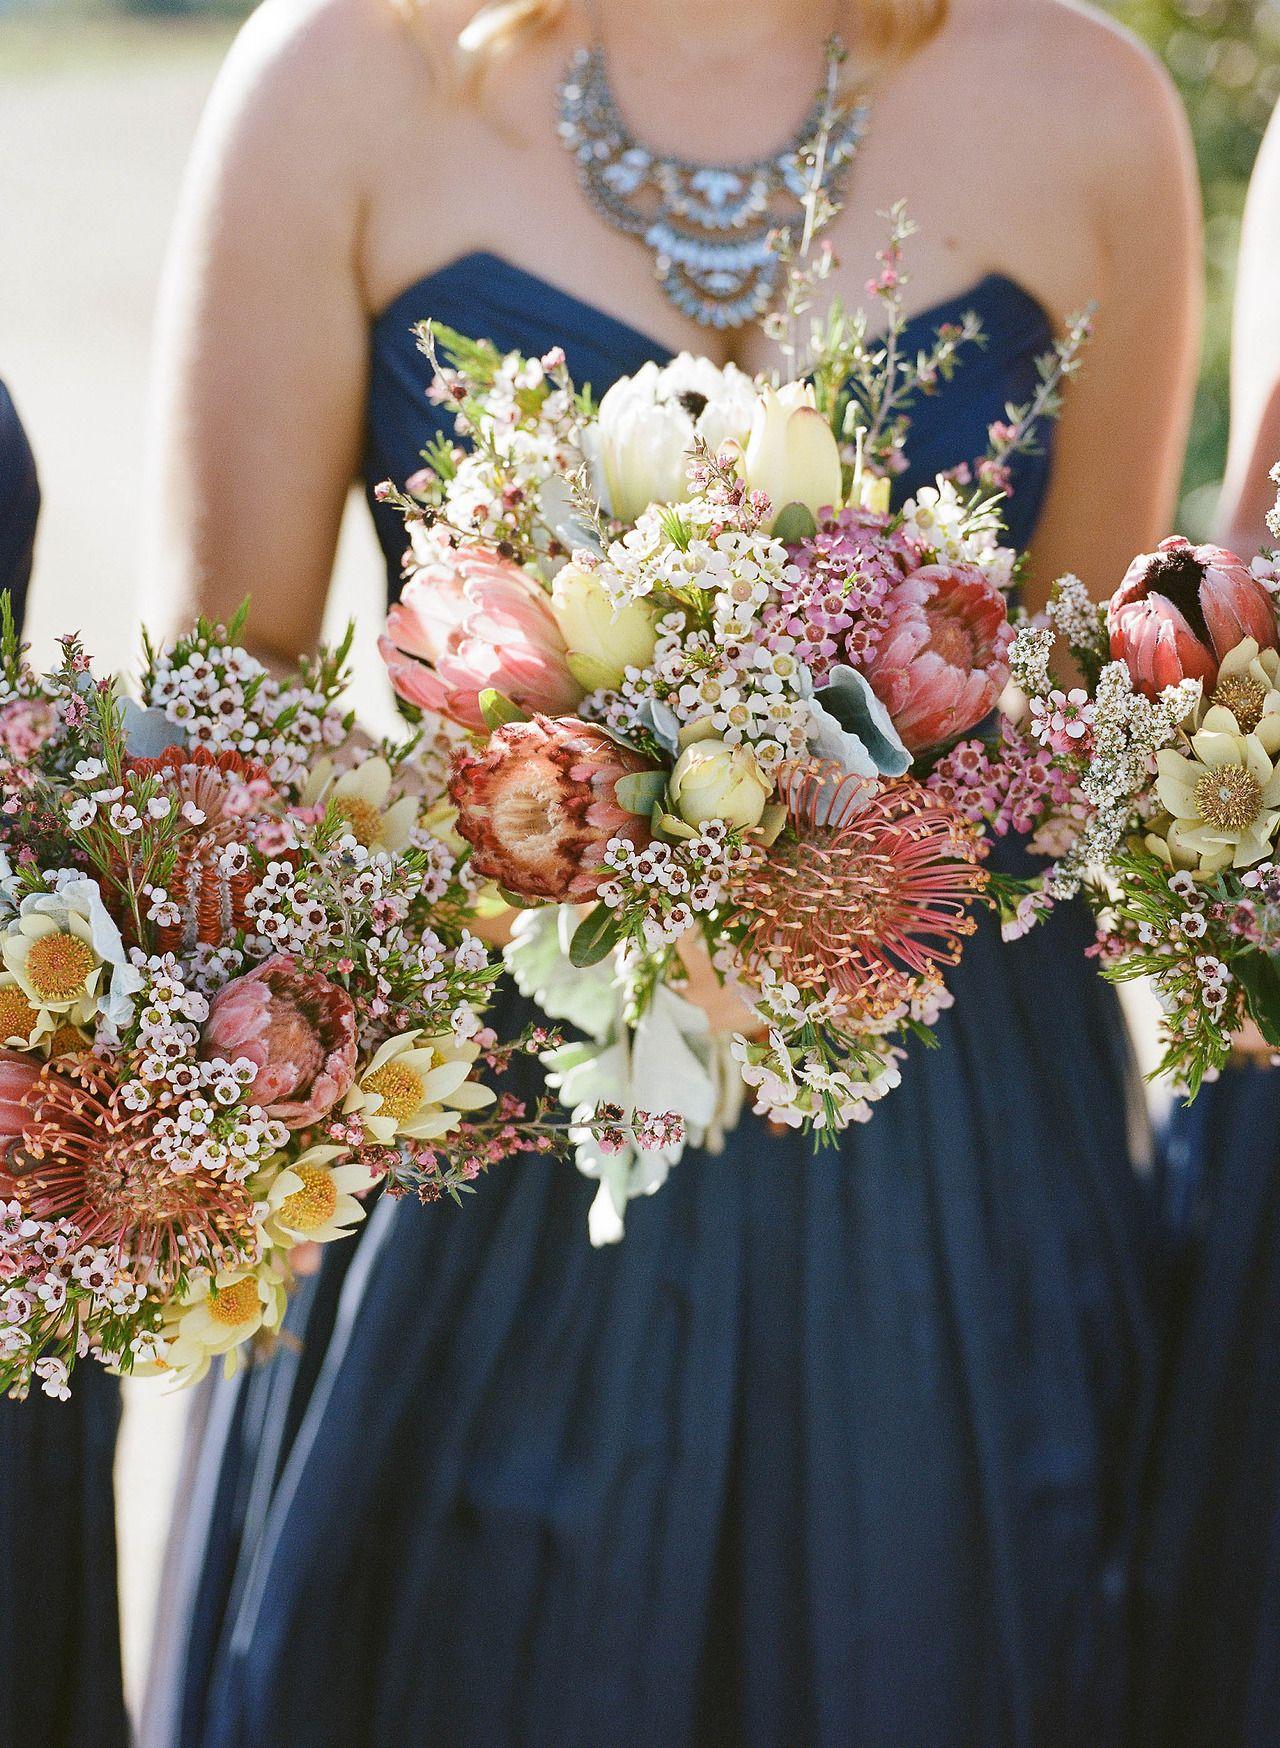 Steal Worthy Wedding Flower Ideas Navy Colors